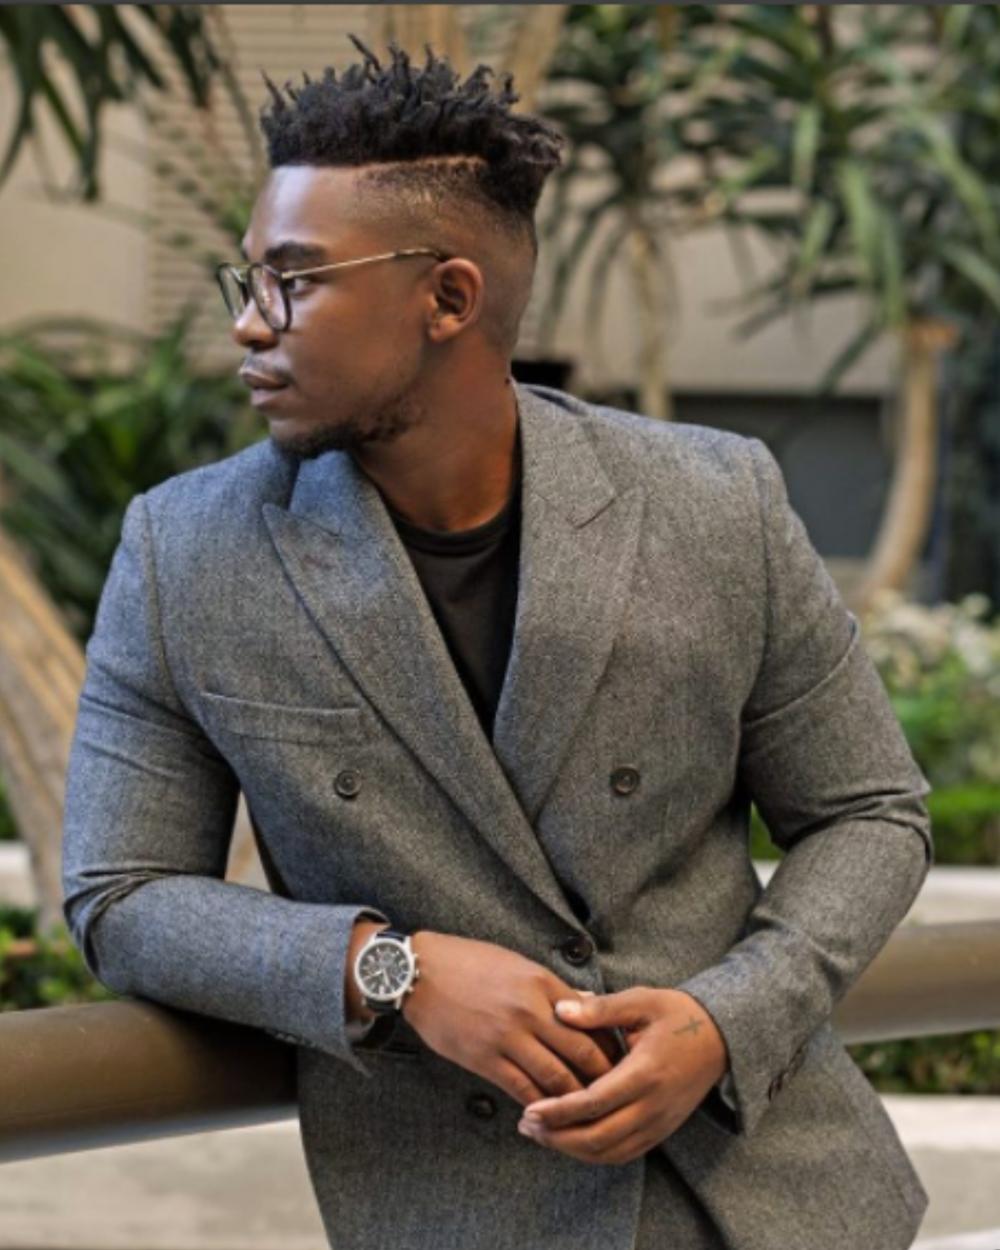 SABC 3 EXPRESSO BREAKFAST SHOW INTERVIEW: Entrepreneurism 101 - WATCH NOW